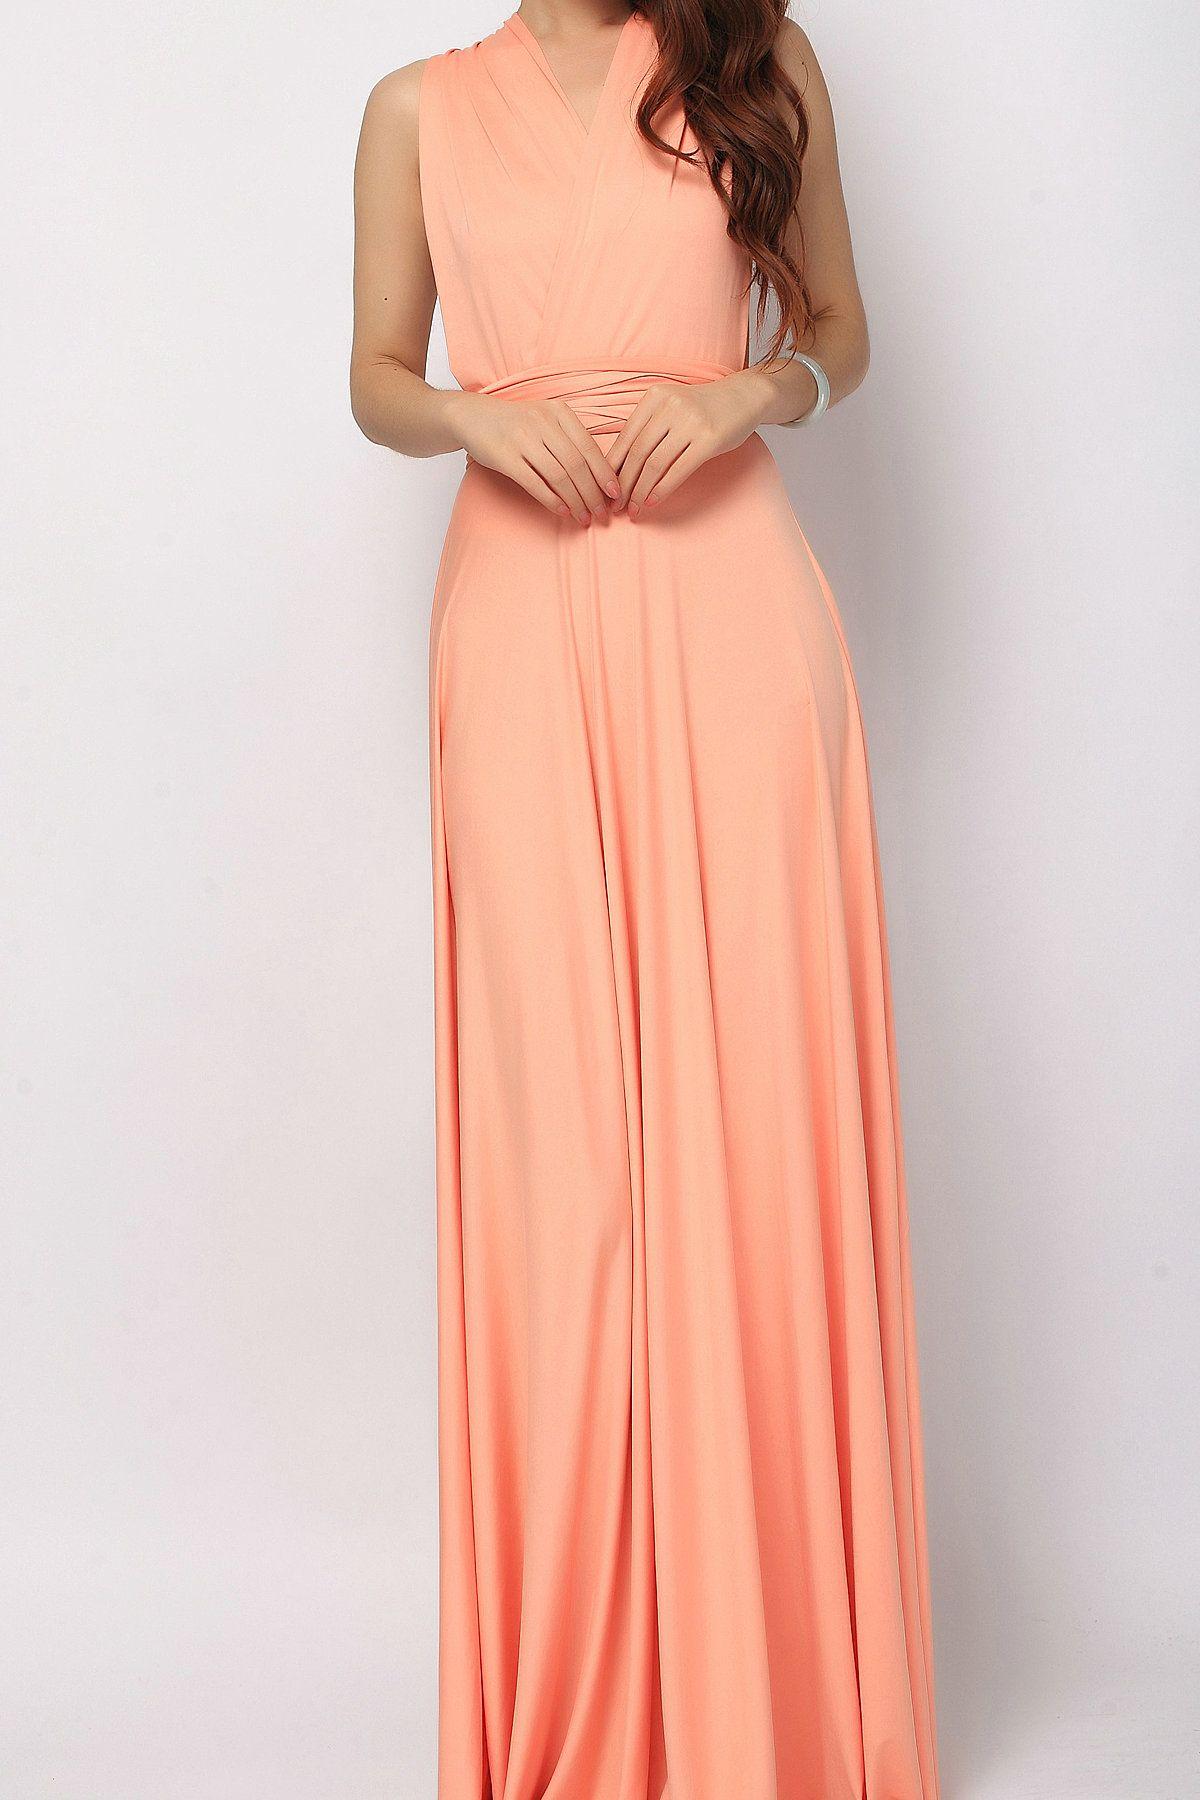 77ca033992 Salmon long infinity dress bridesmaid dress